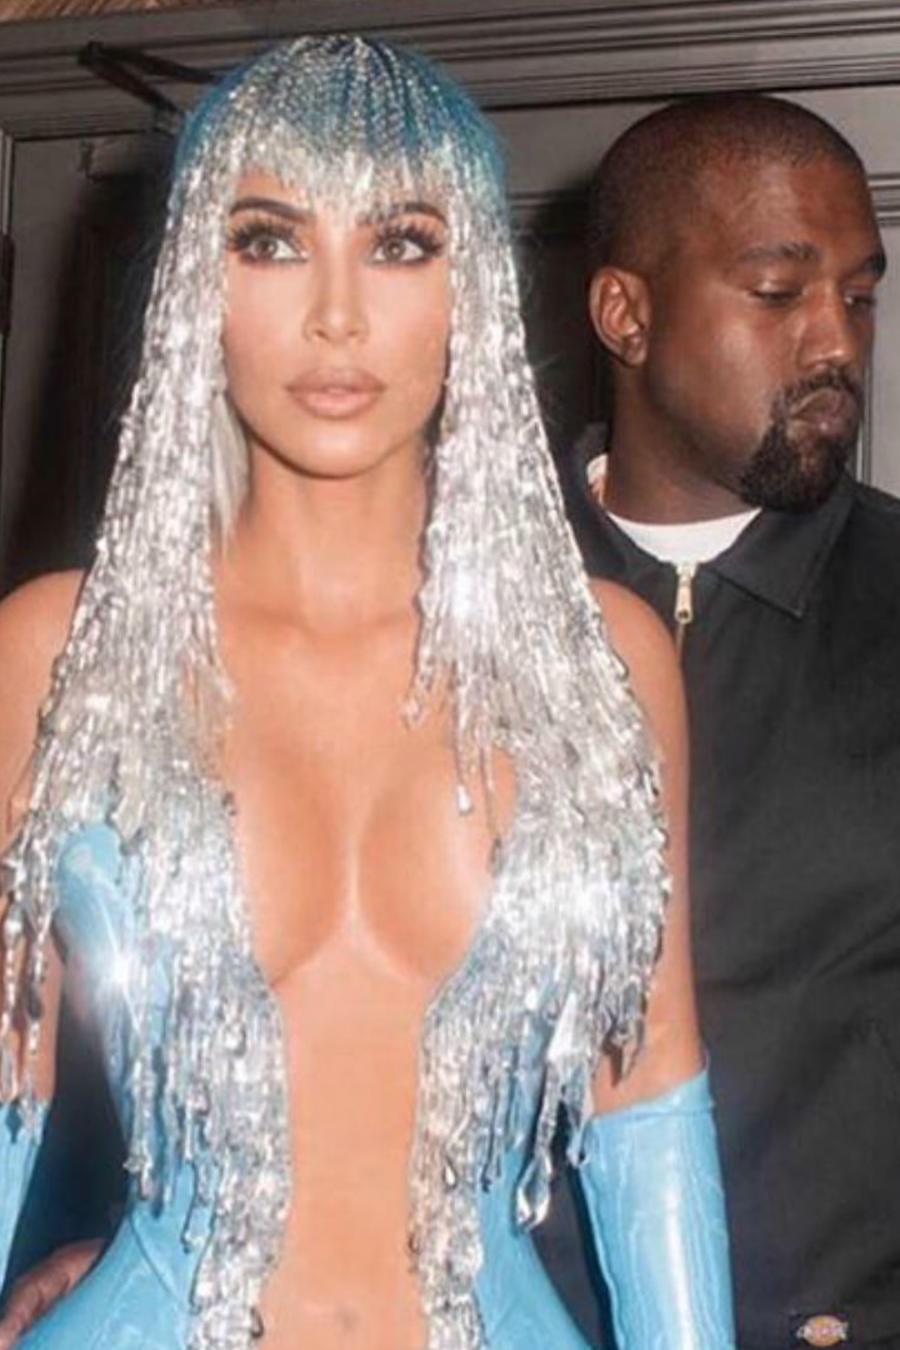 Kim Kardashian con vestido azul escotado